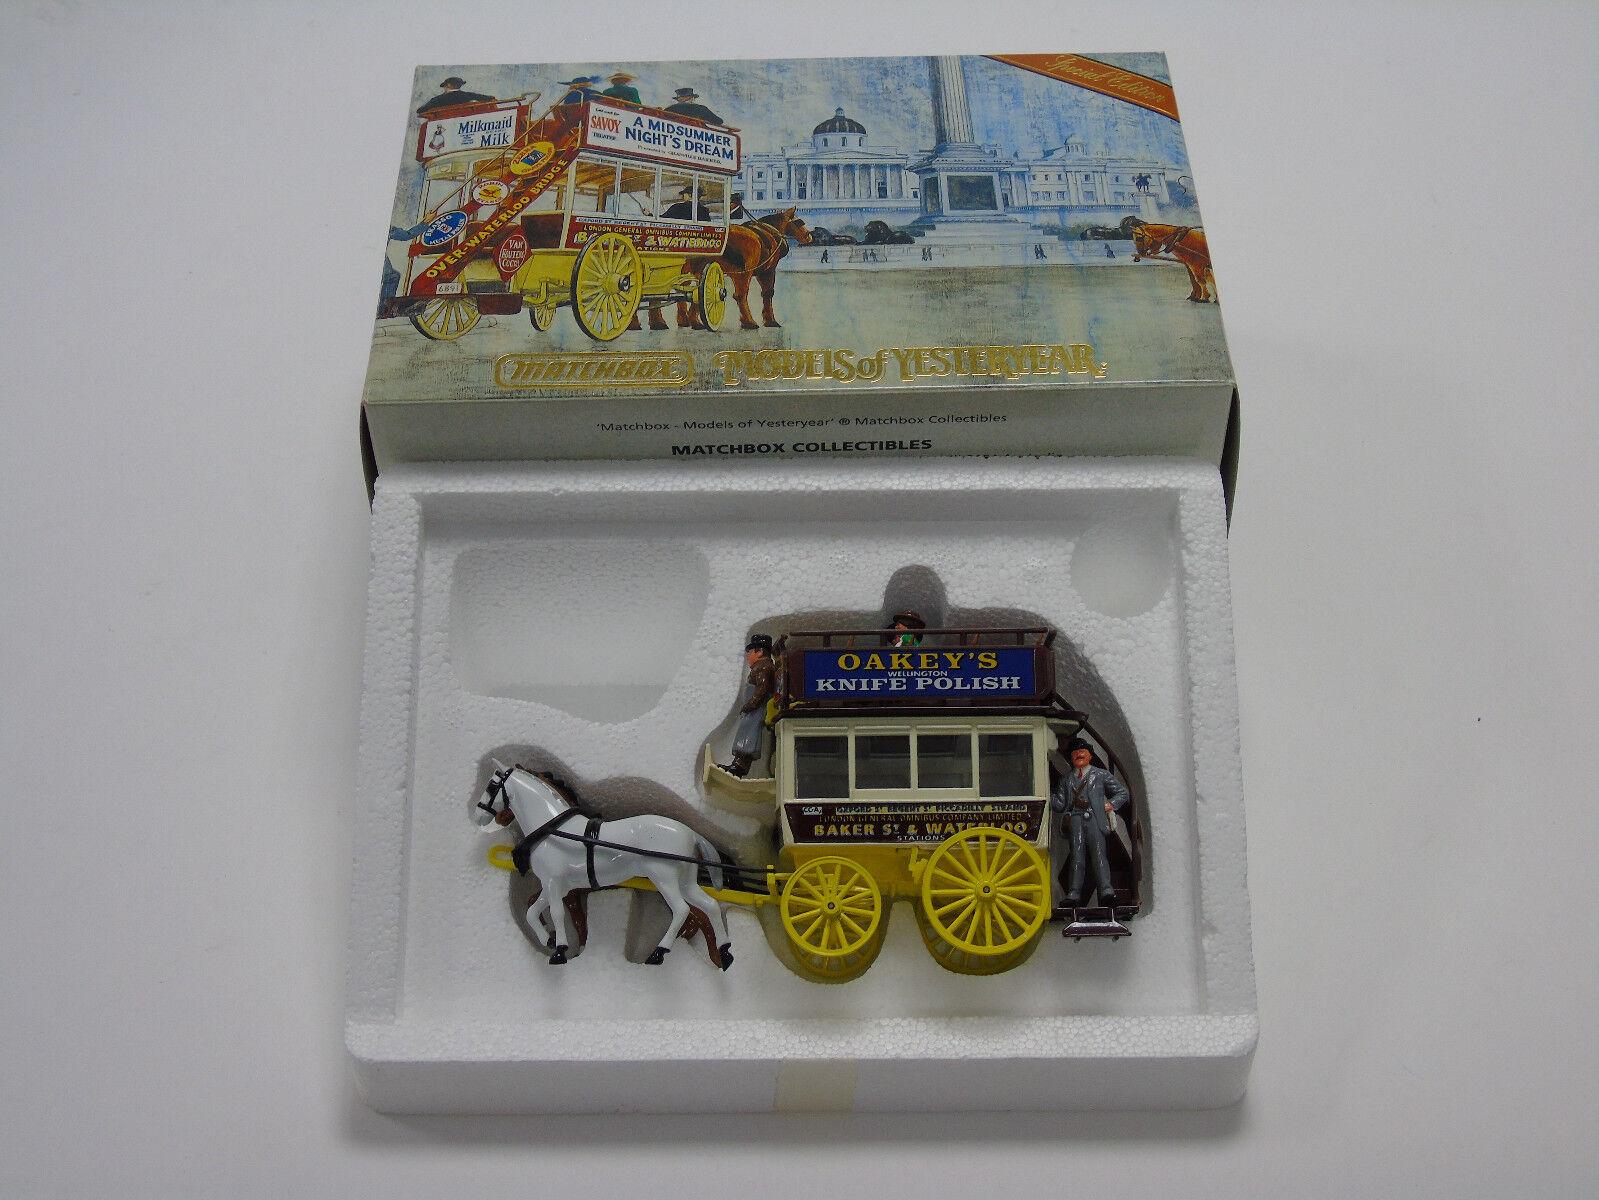 YSH2 Matchbox Models Of Yesteryear Londres Omnibus 1886 Horsedrawn Carosse en